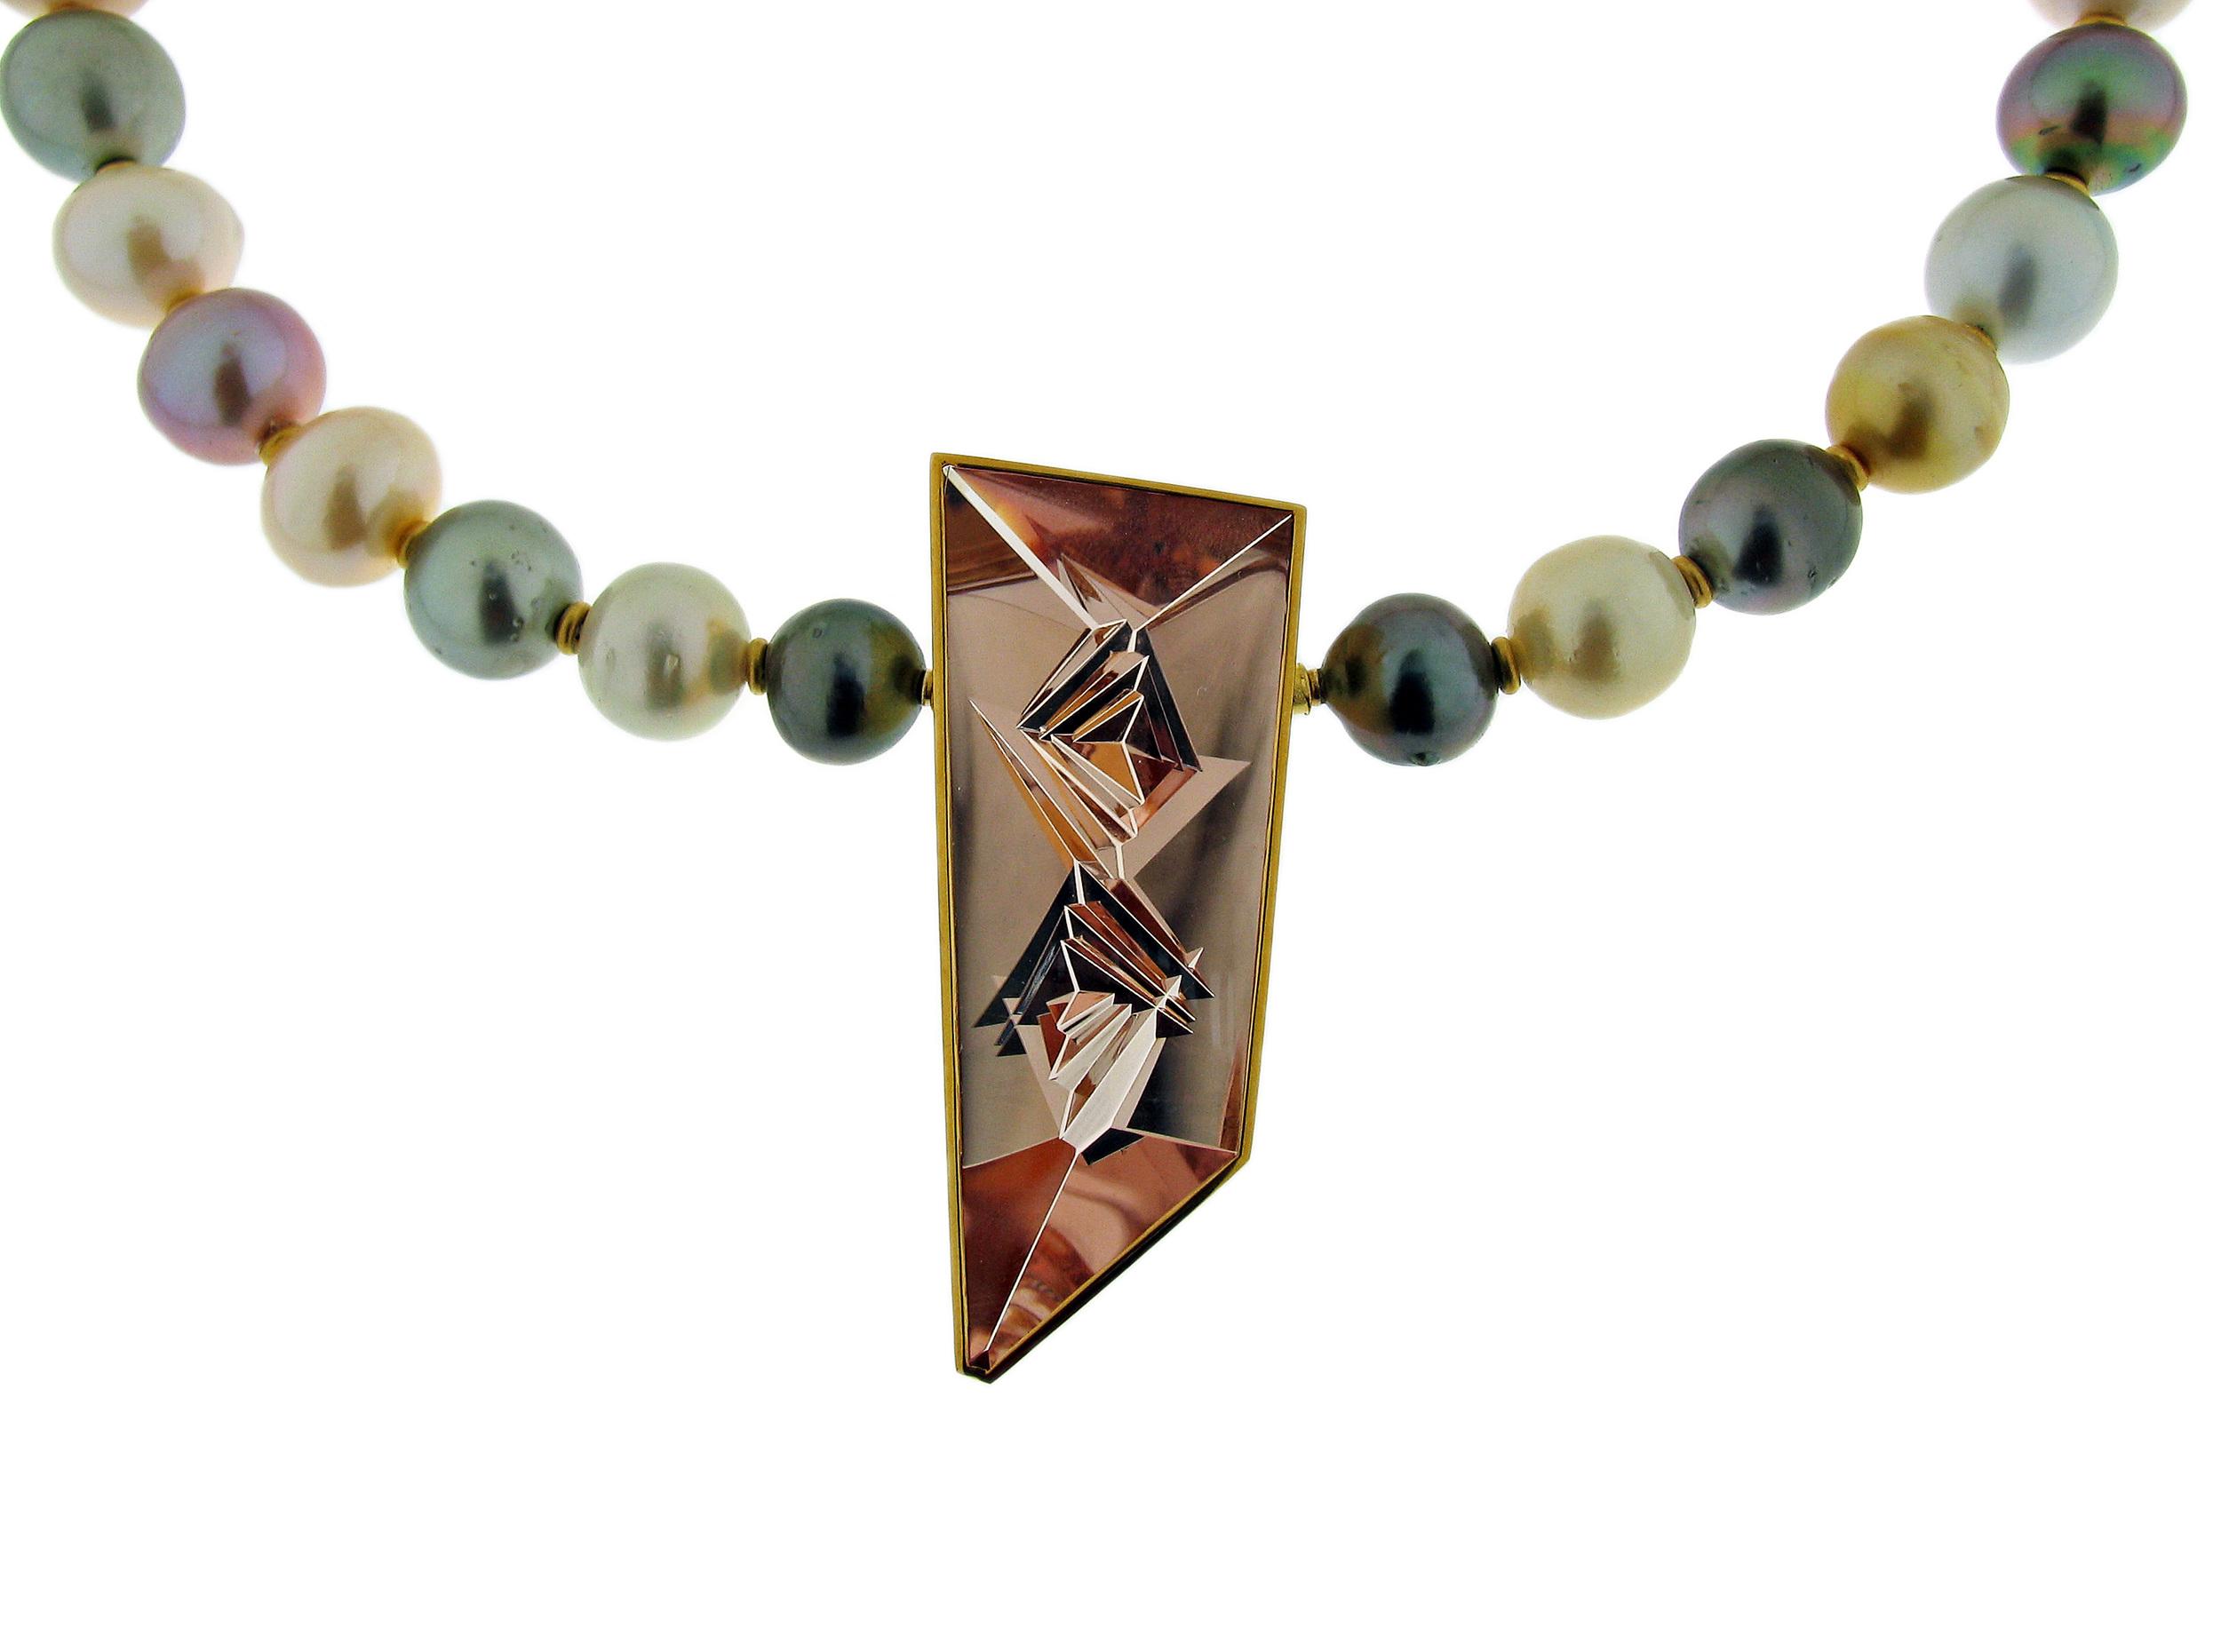 unique-morganite-munsteiner-pendant-pearl-strand-craft-revival-jewelry-store-grand-rapids